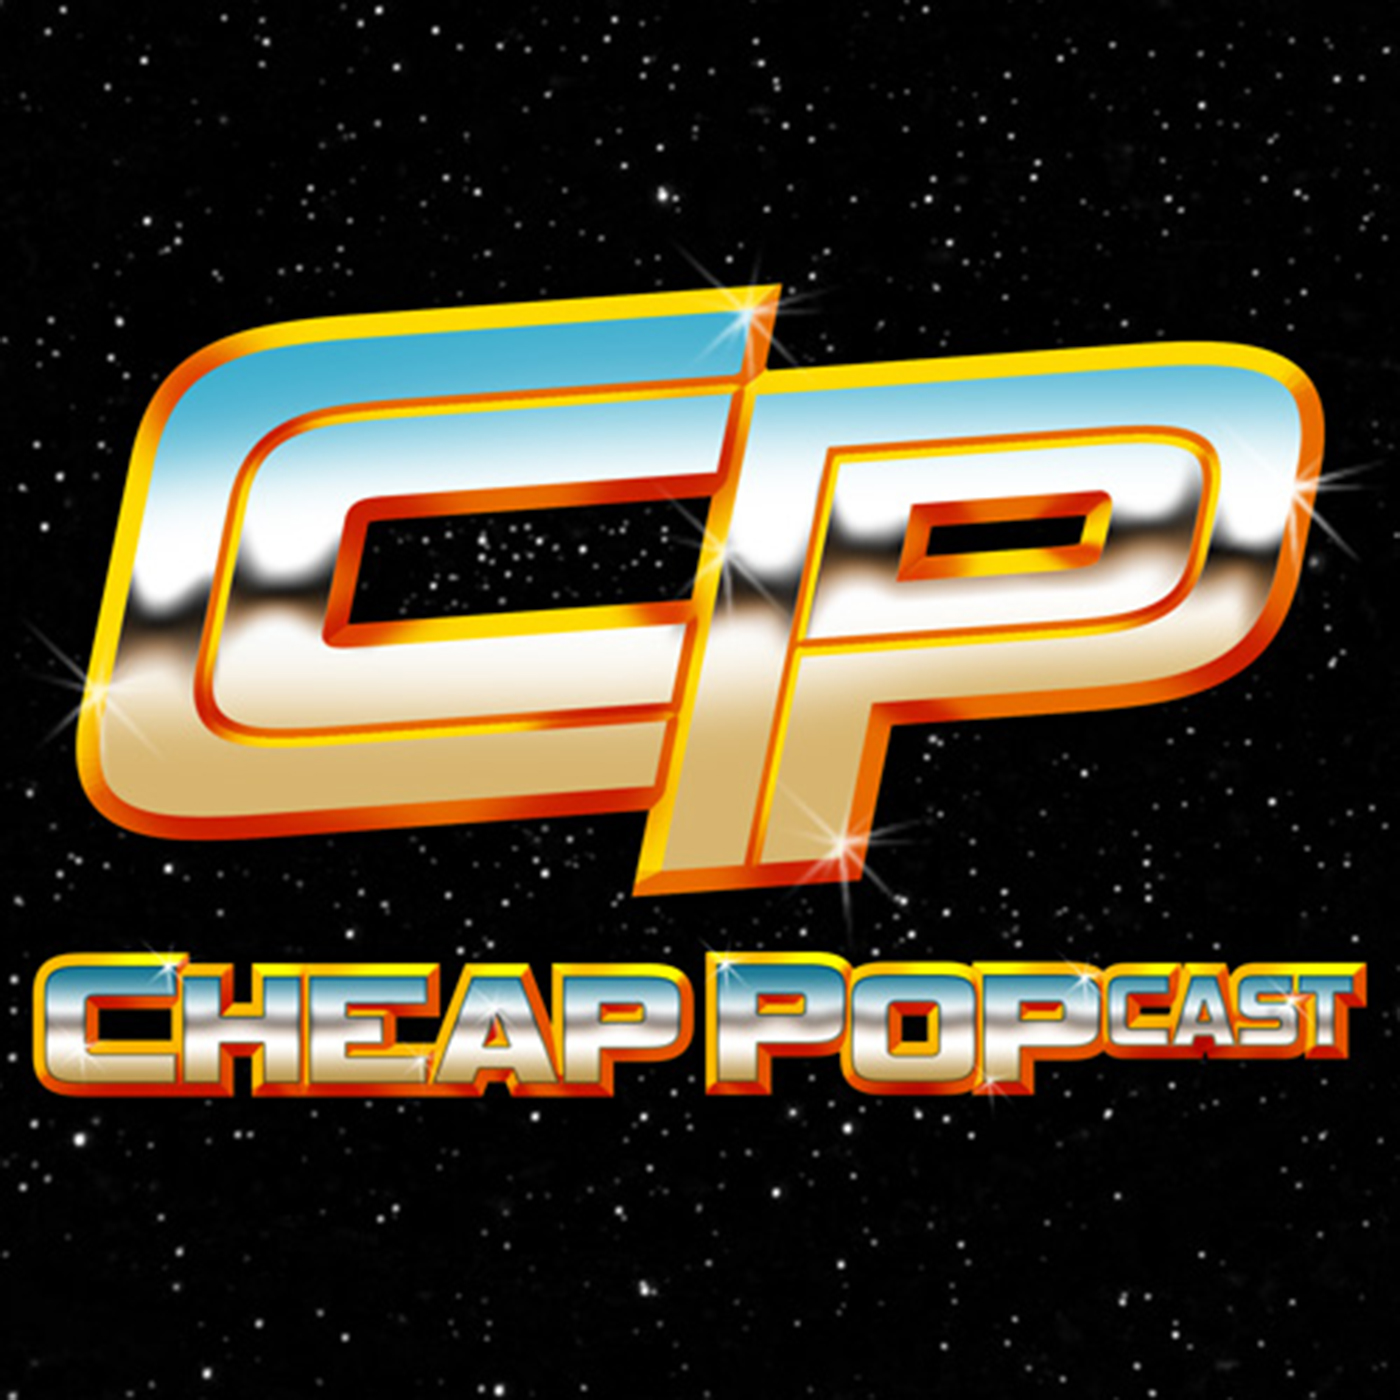 Cheap Popcast show art